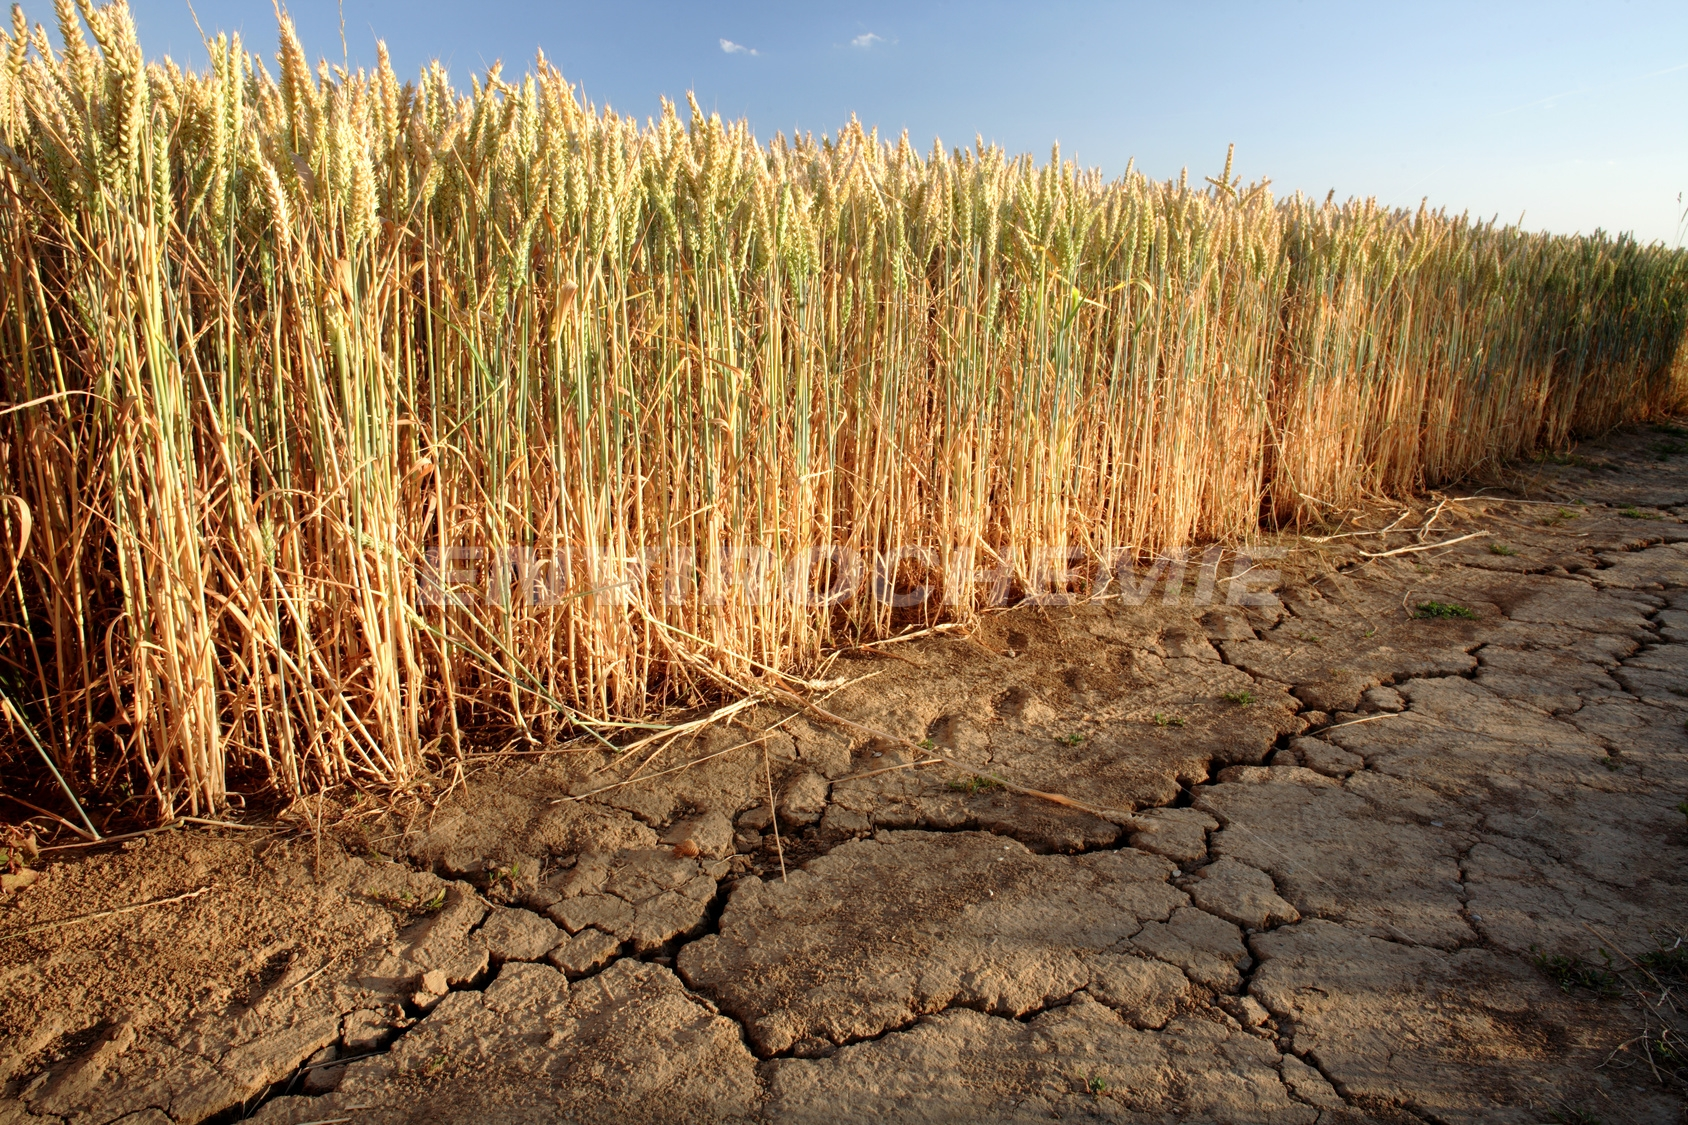 Trockenes Getreidefeld im Sommer